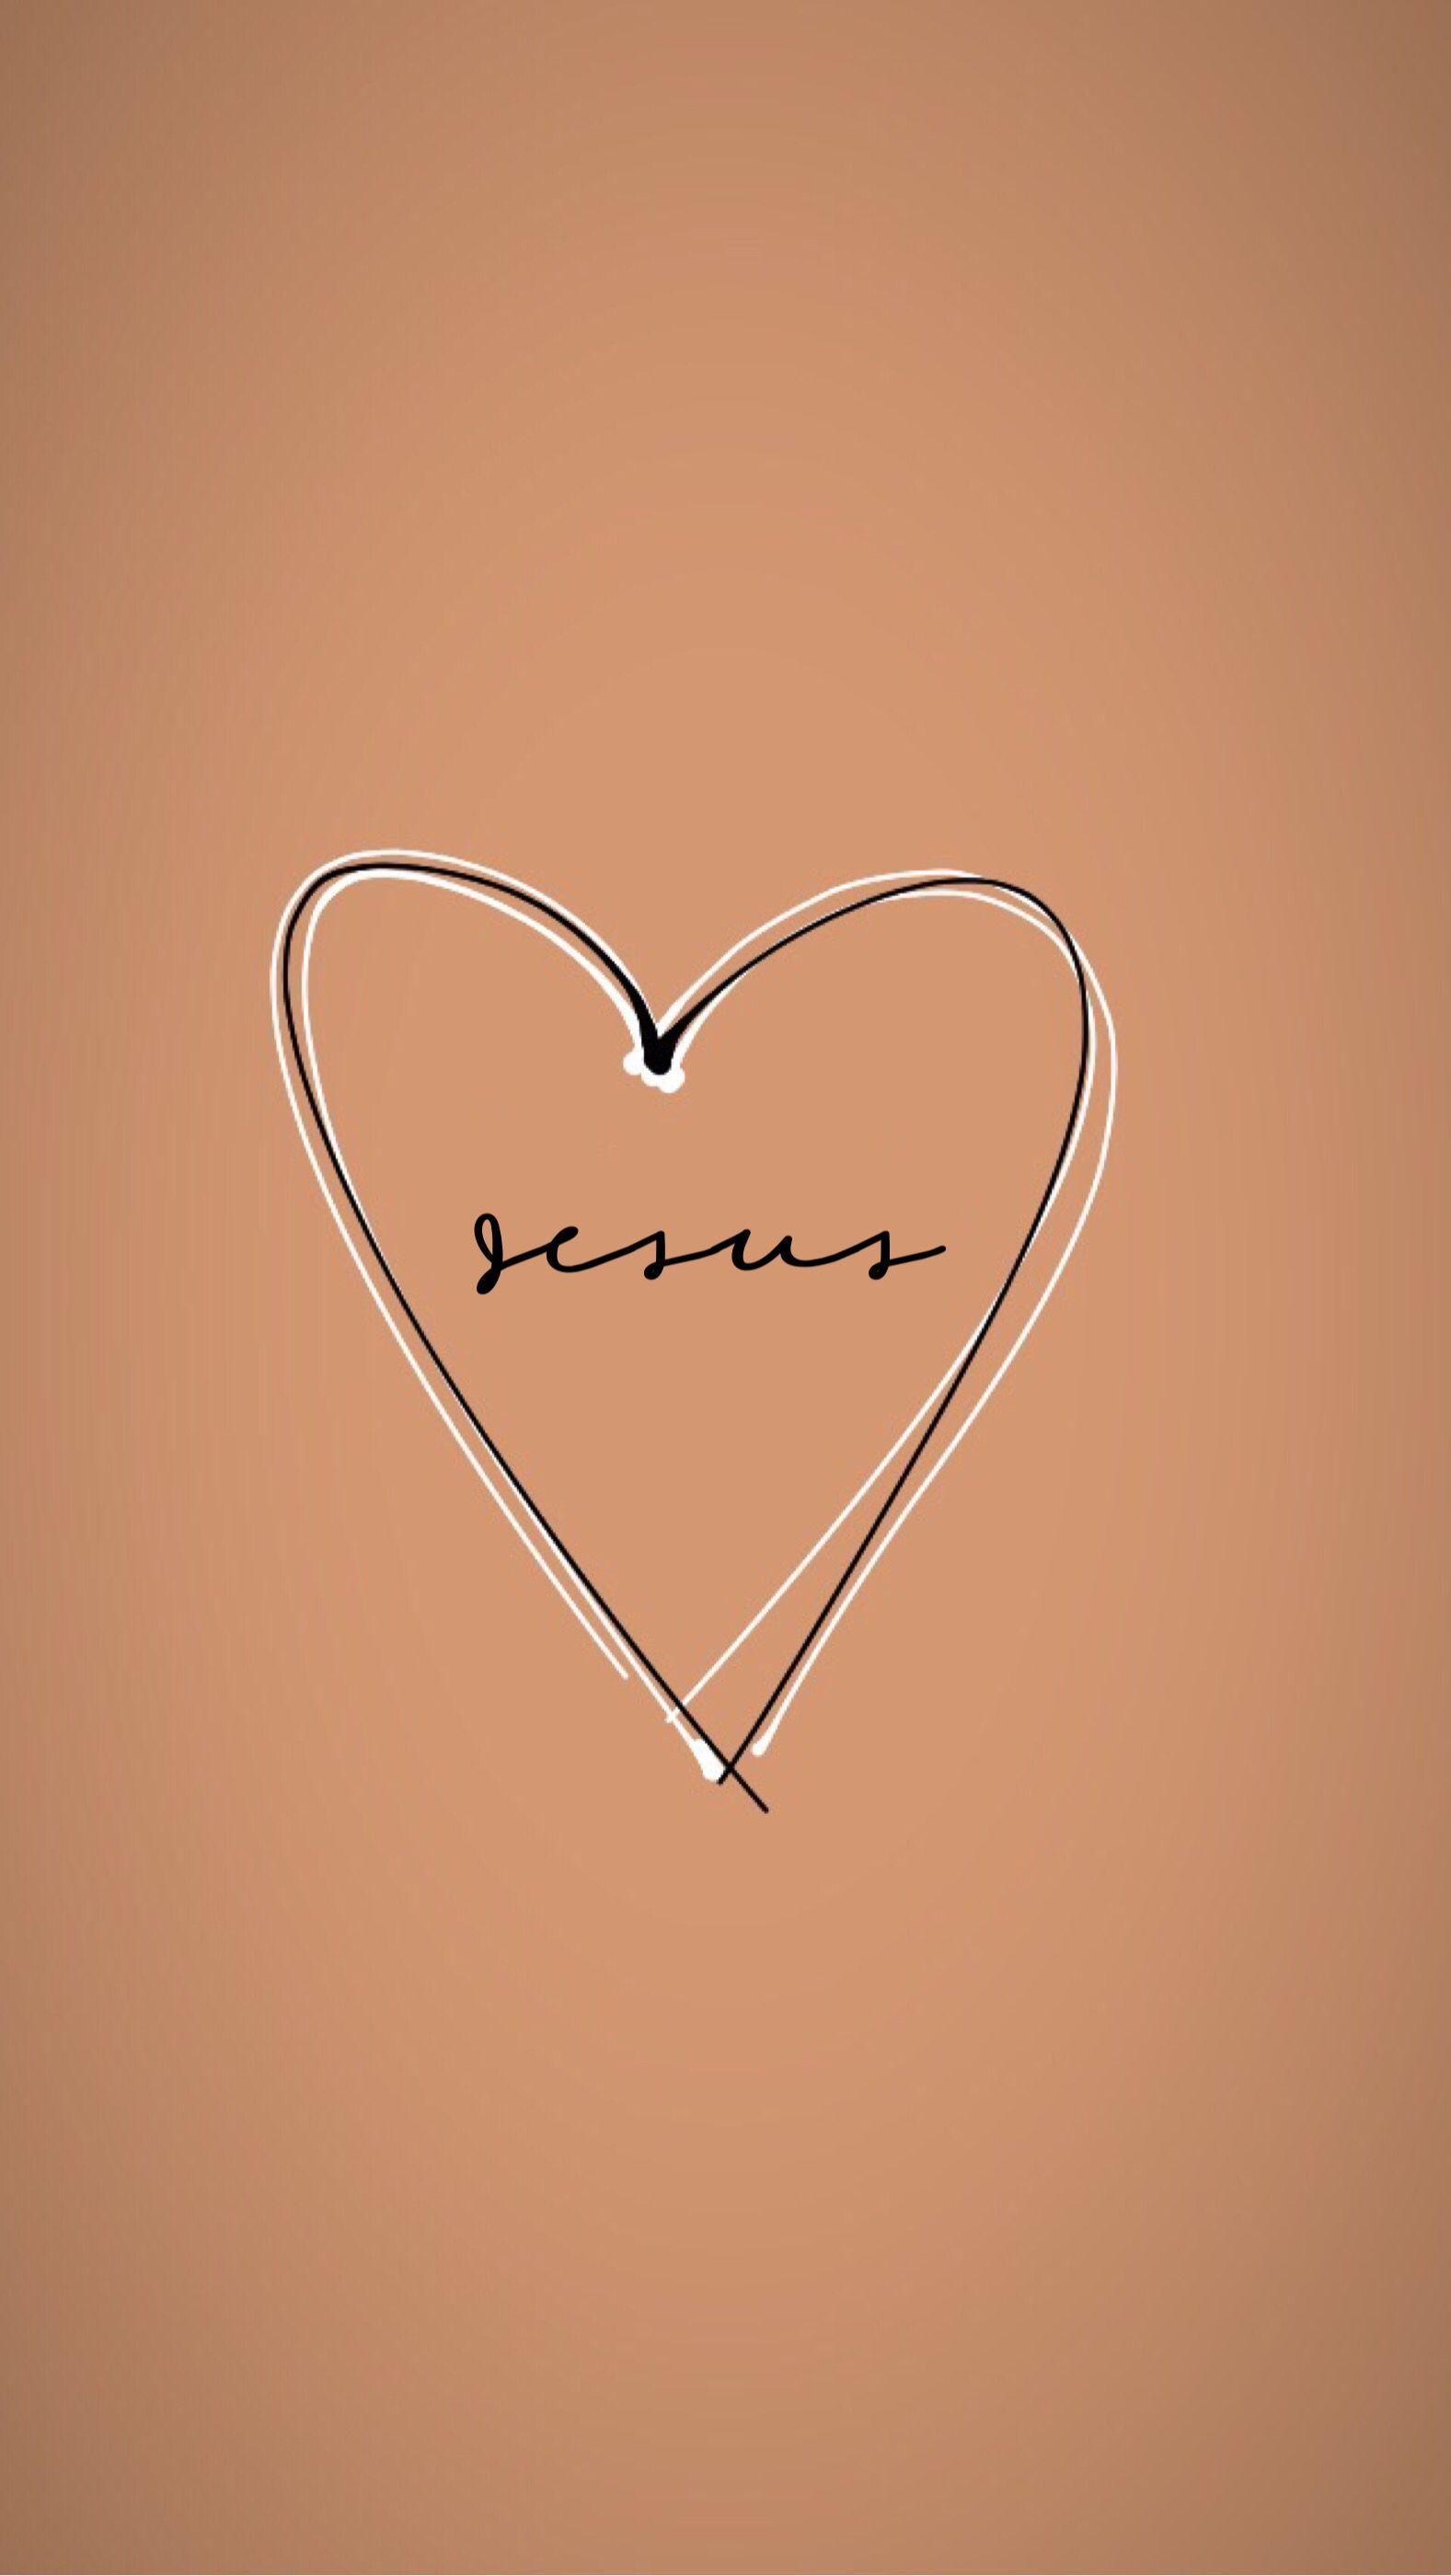 Give Me Jesus Bible Verse Wallpaper Christian Wallpaper Verses Wallpaper